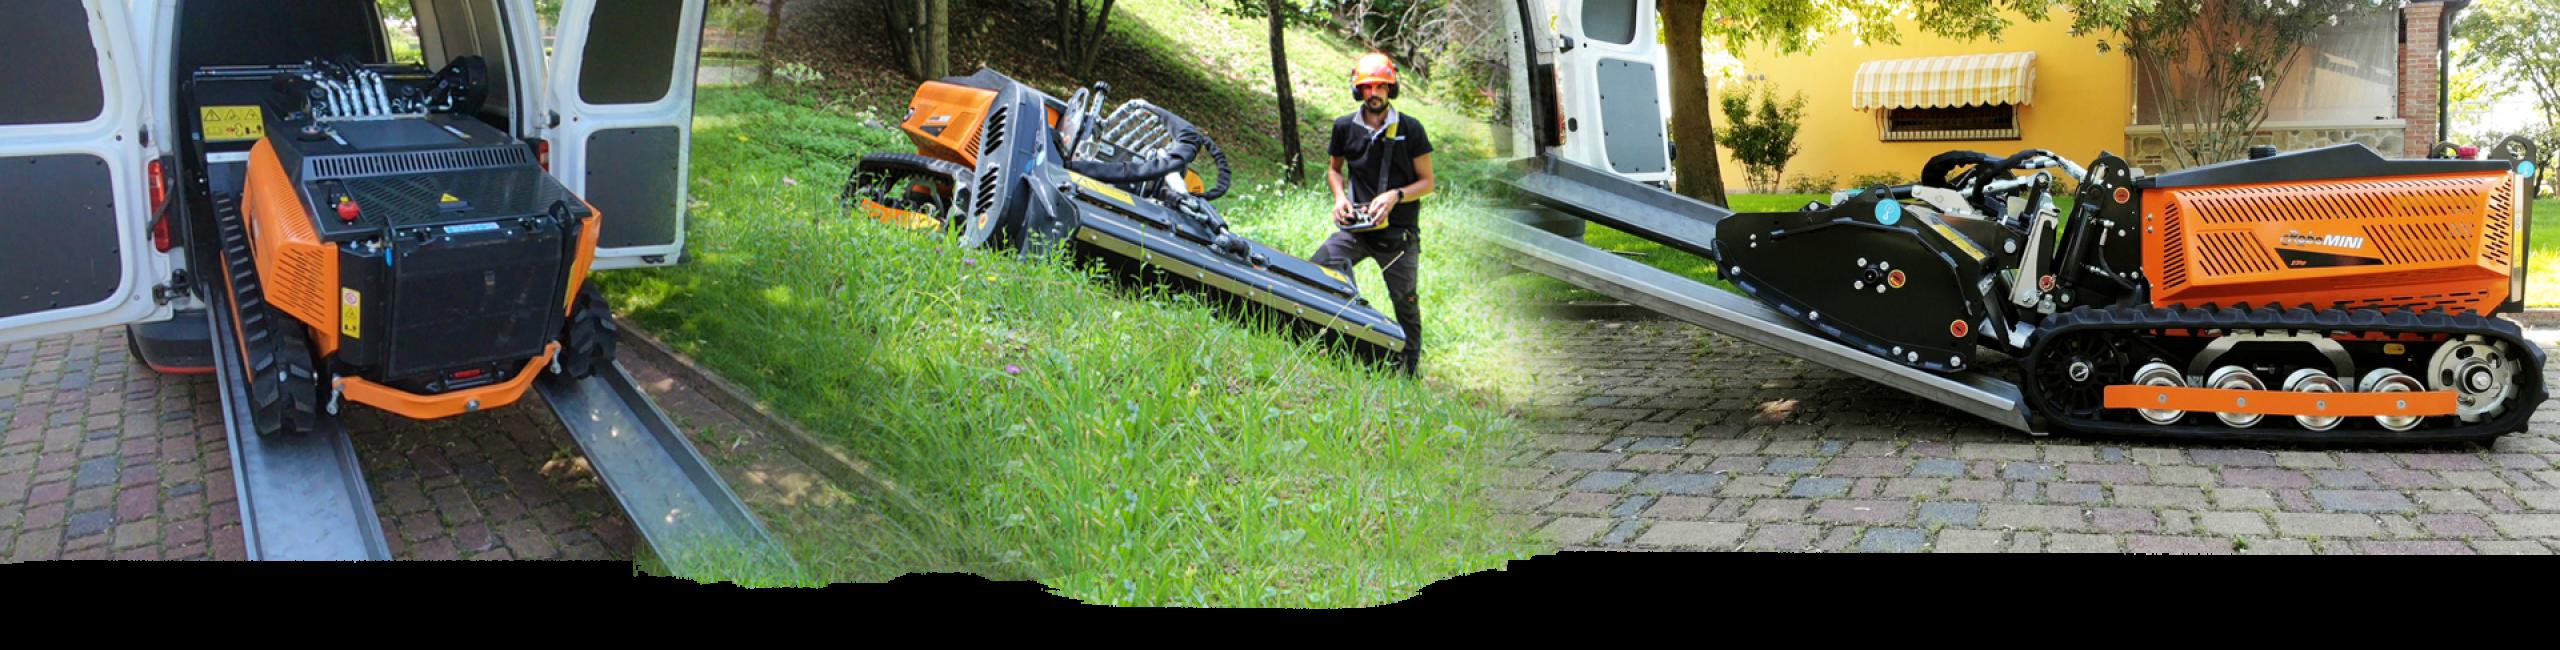 robomini - machine compacte - energreen france porte outils professionnels